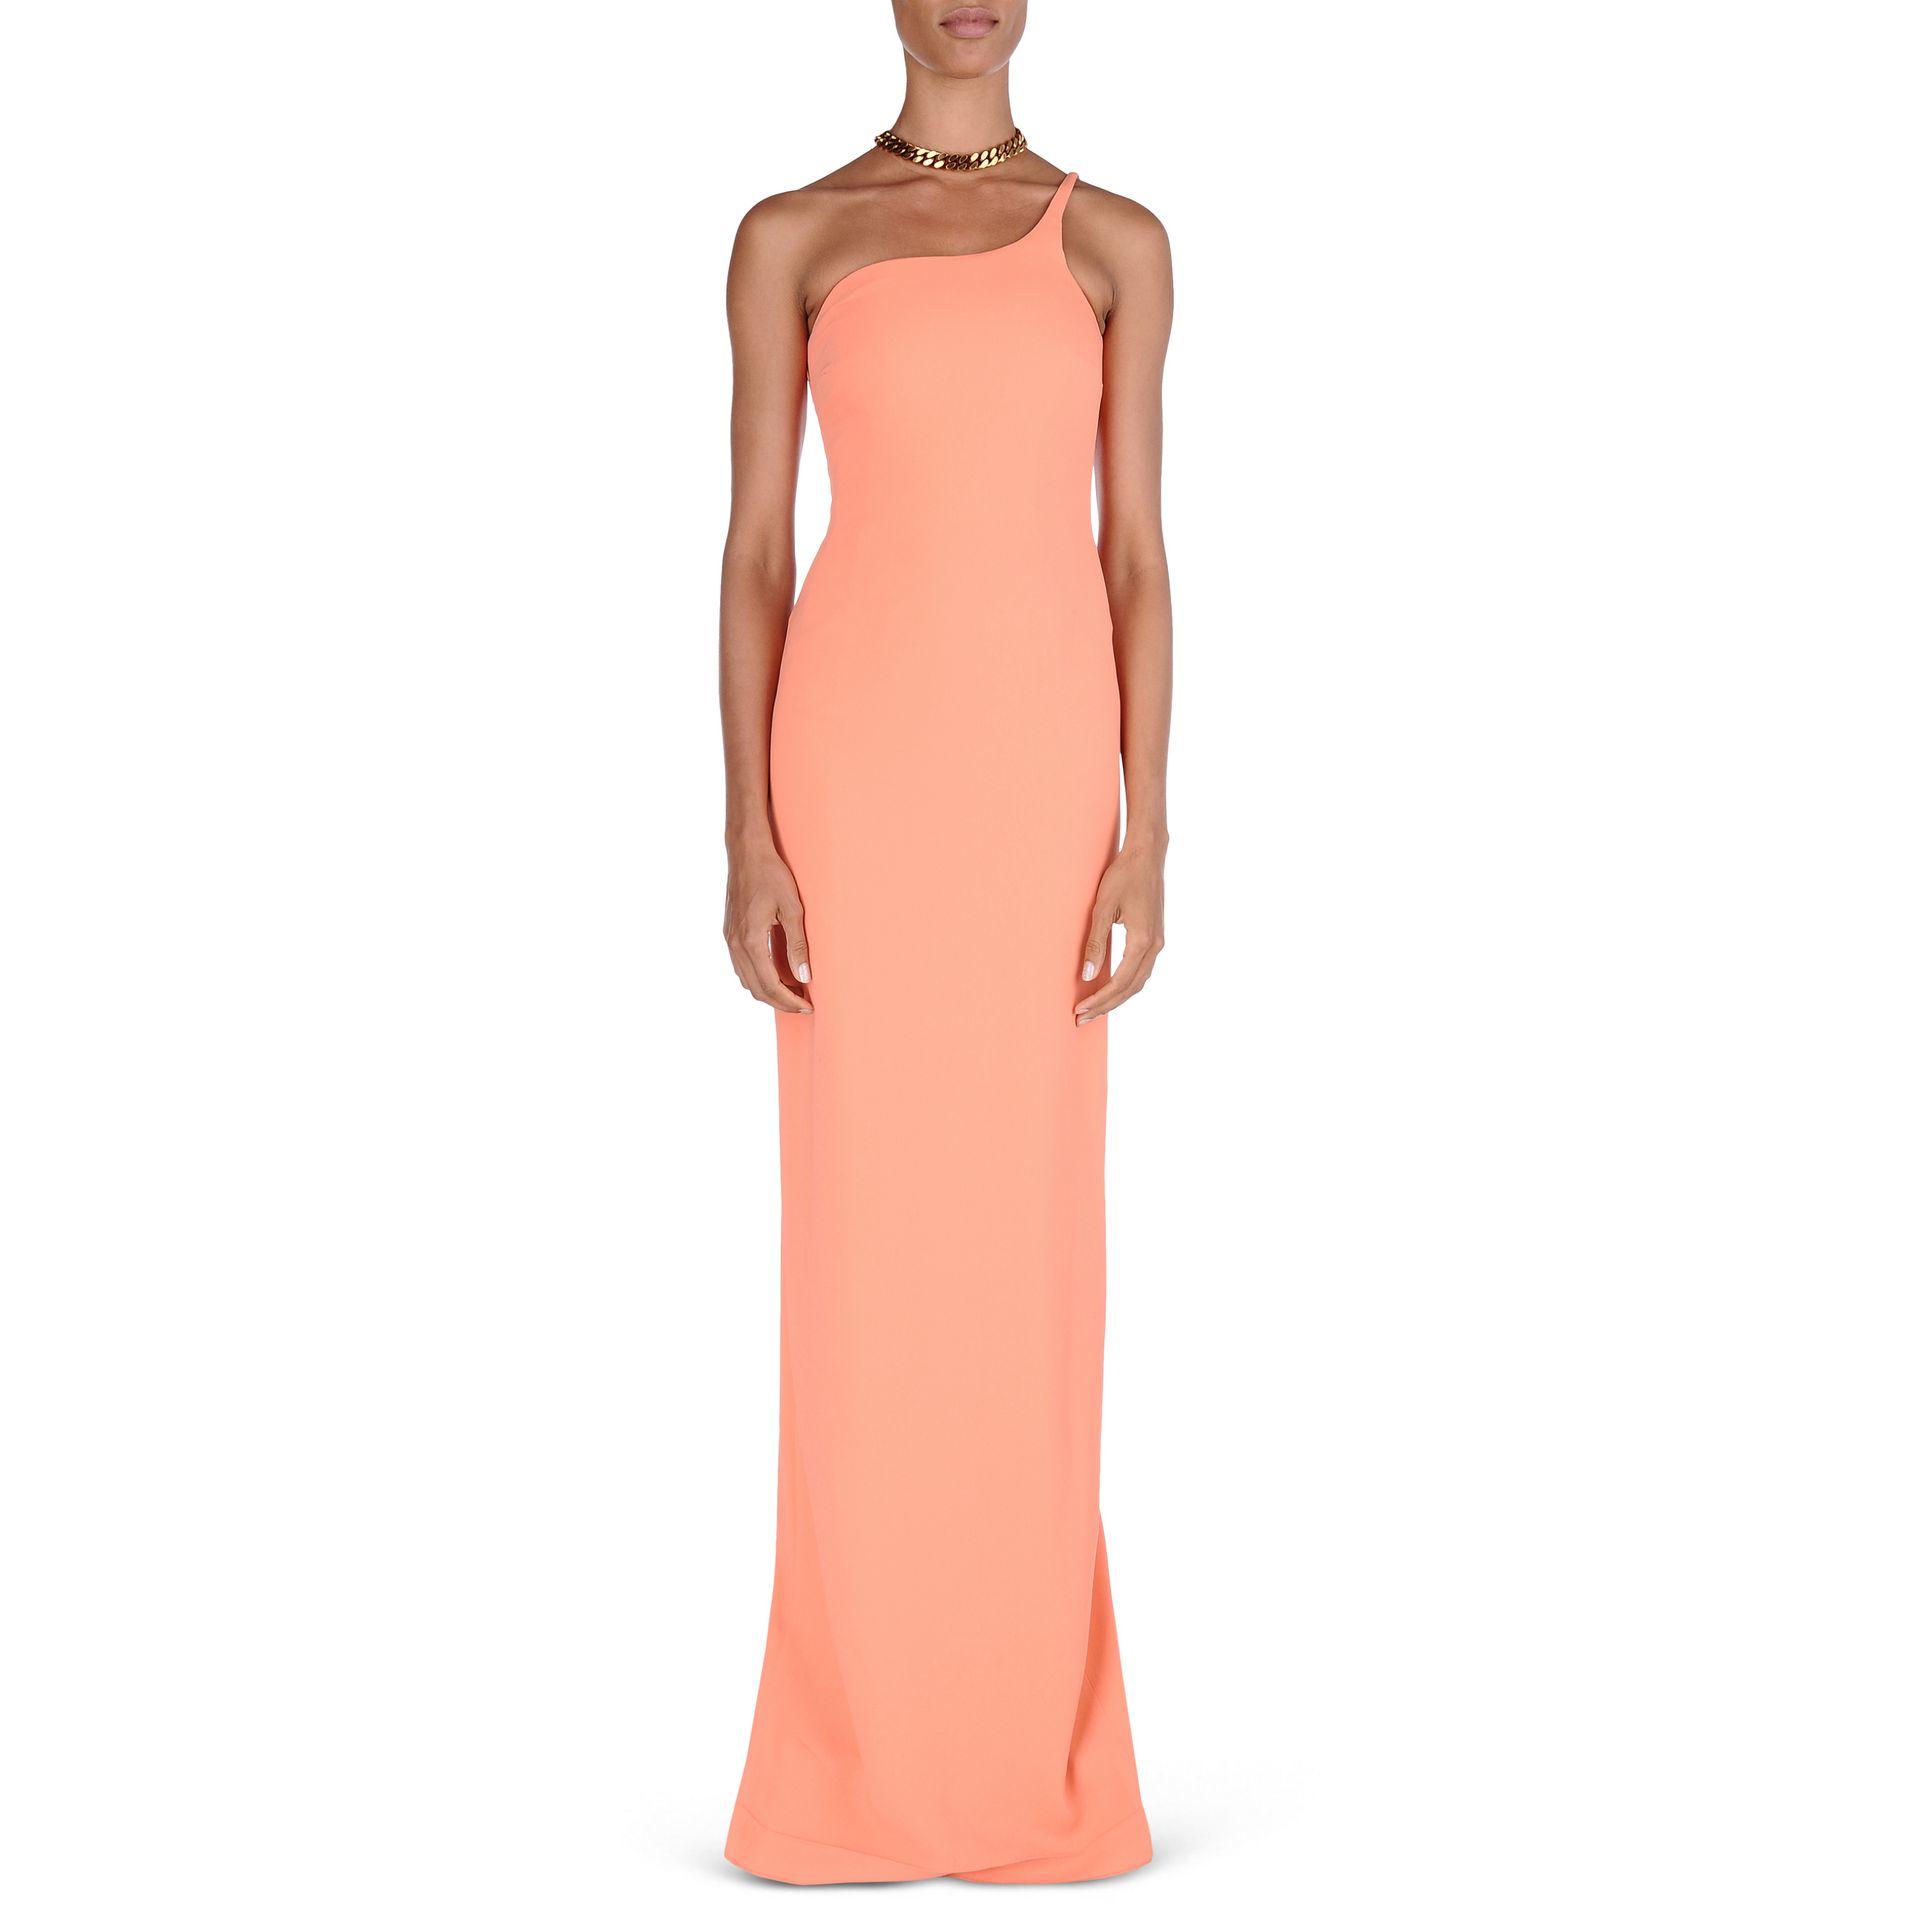 Lyst - Stella Mccartney Mirabella Dress in Orange